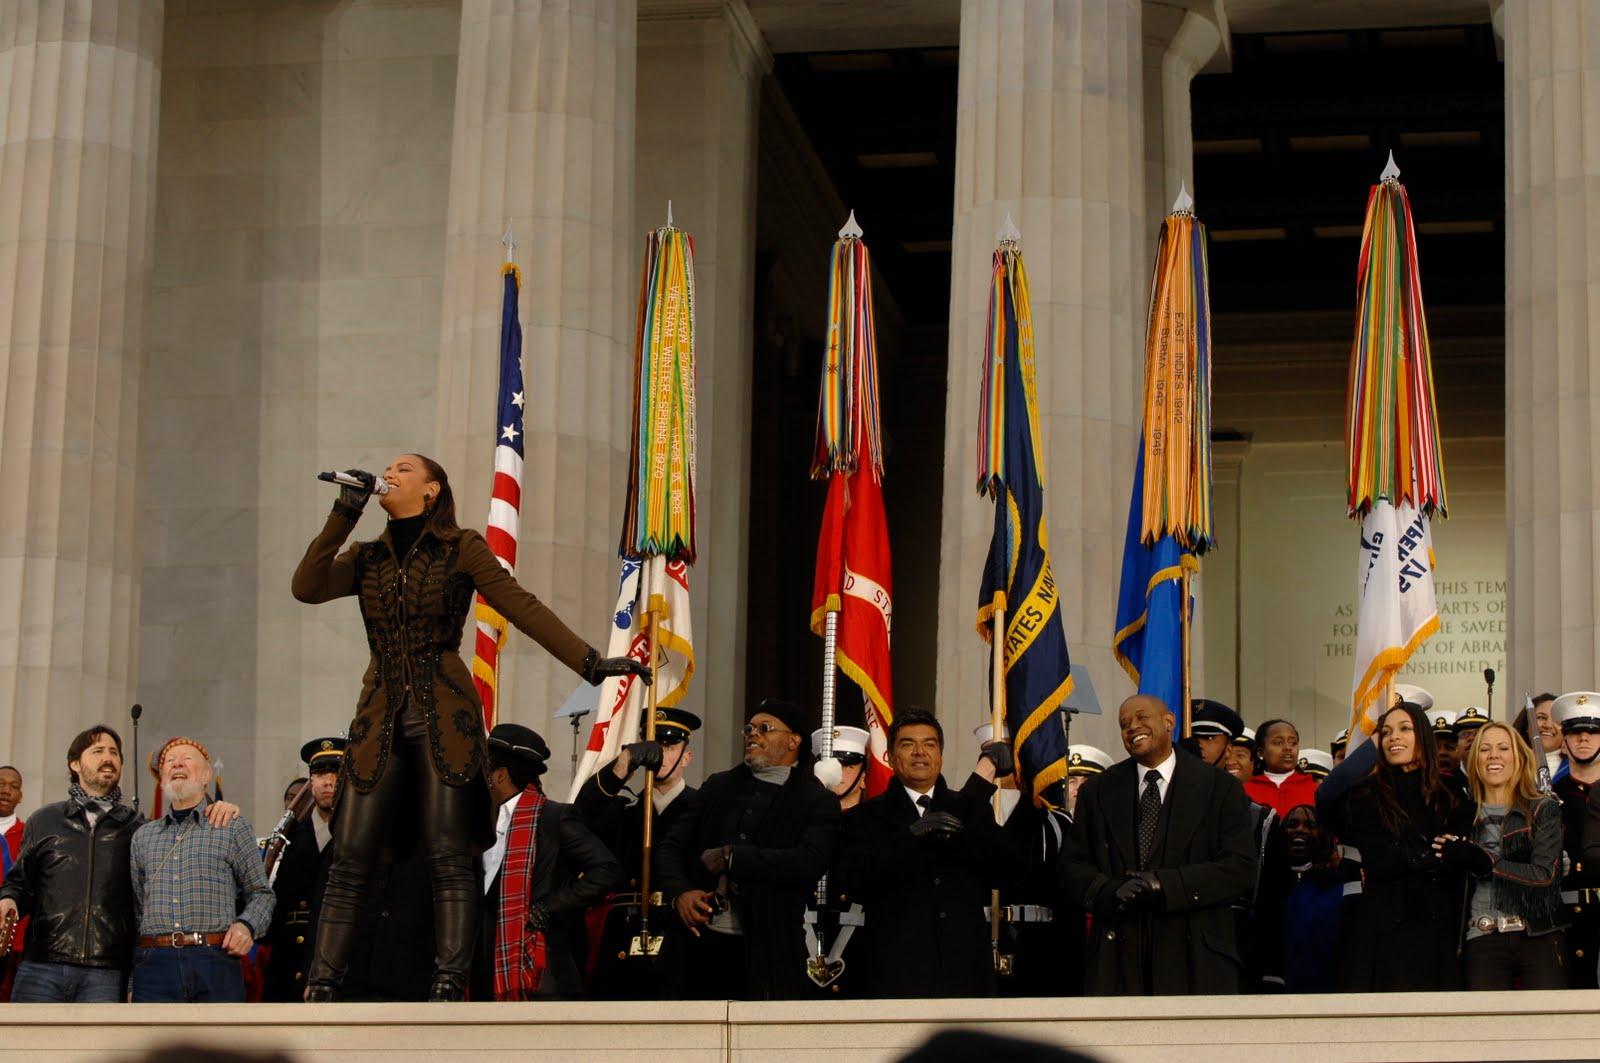 http://3.bp.blogspot.com/_Nuta_CQvImI/TJcU4Ki5XRI/AAAAAAAADQw/EO7C1RSdUNU/s1600/Beyonce-Knowles-during-inaugural-opening-ceremonies-at-Lincoln-Memorial.JPG